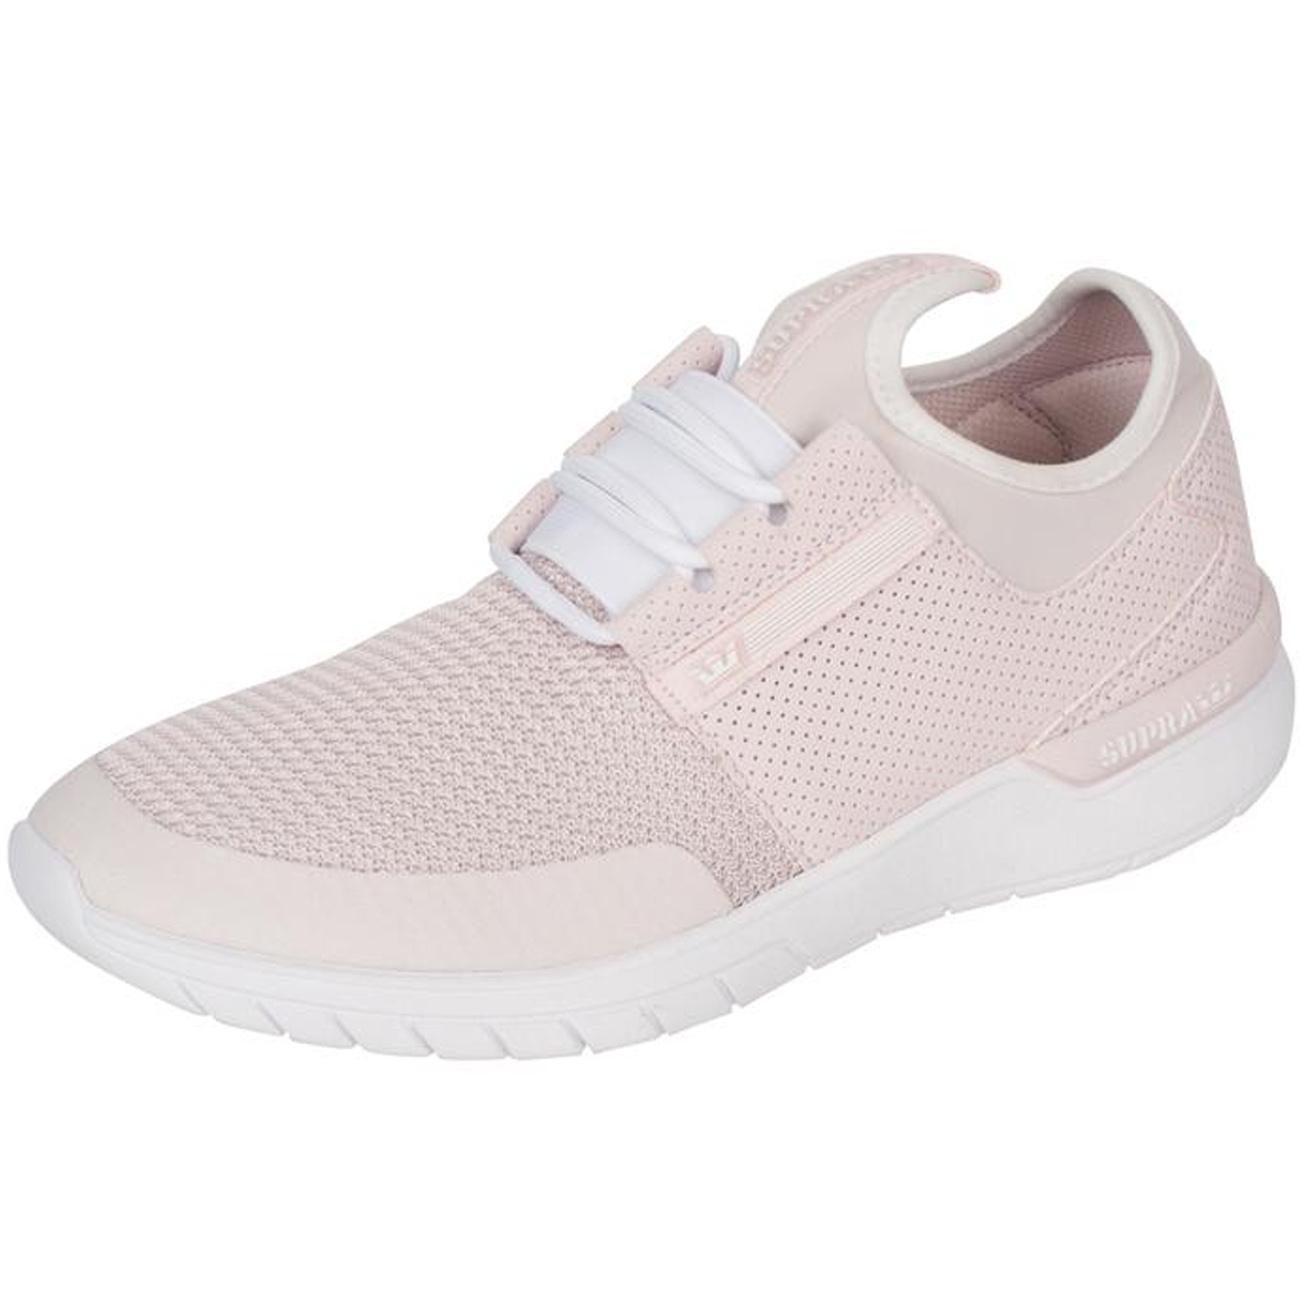 Supra Men's Flow Run Shoes 08021-619